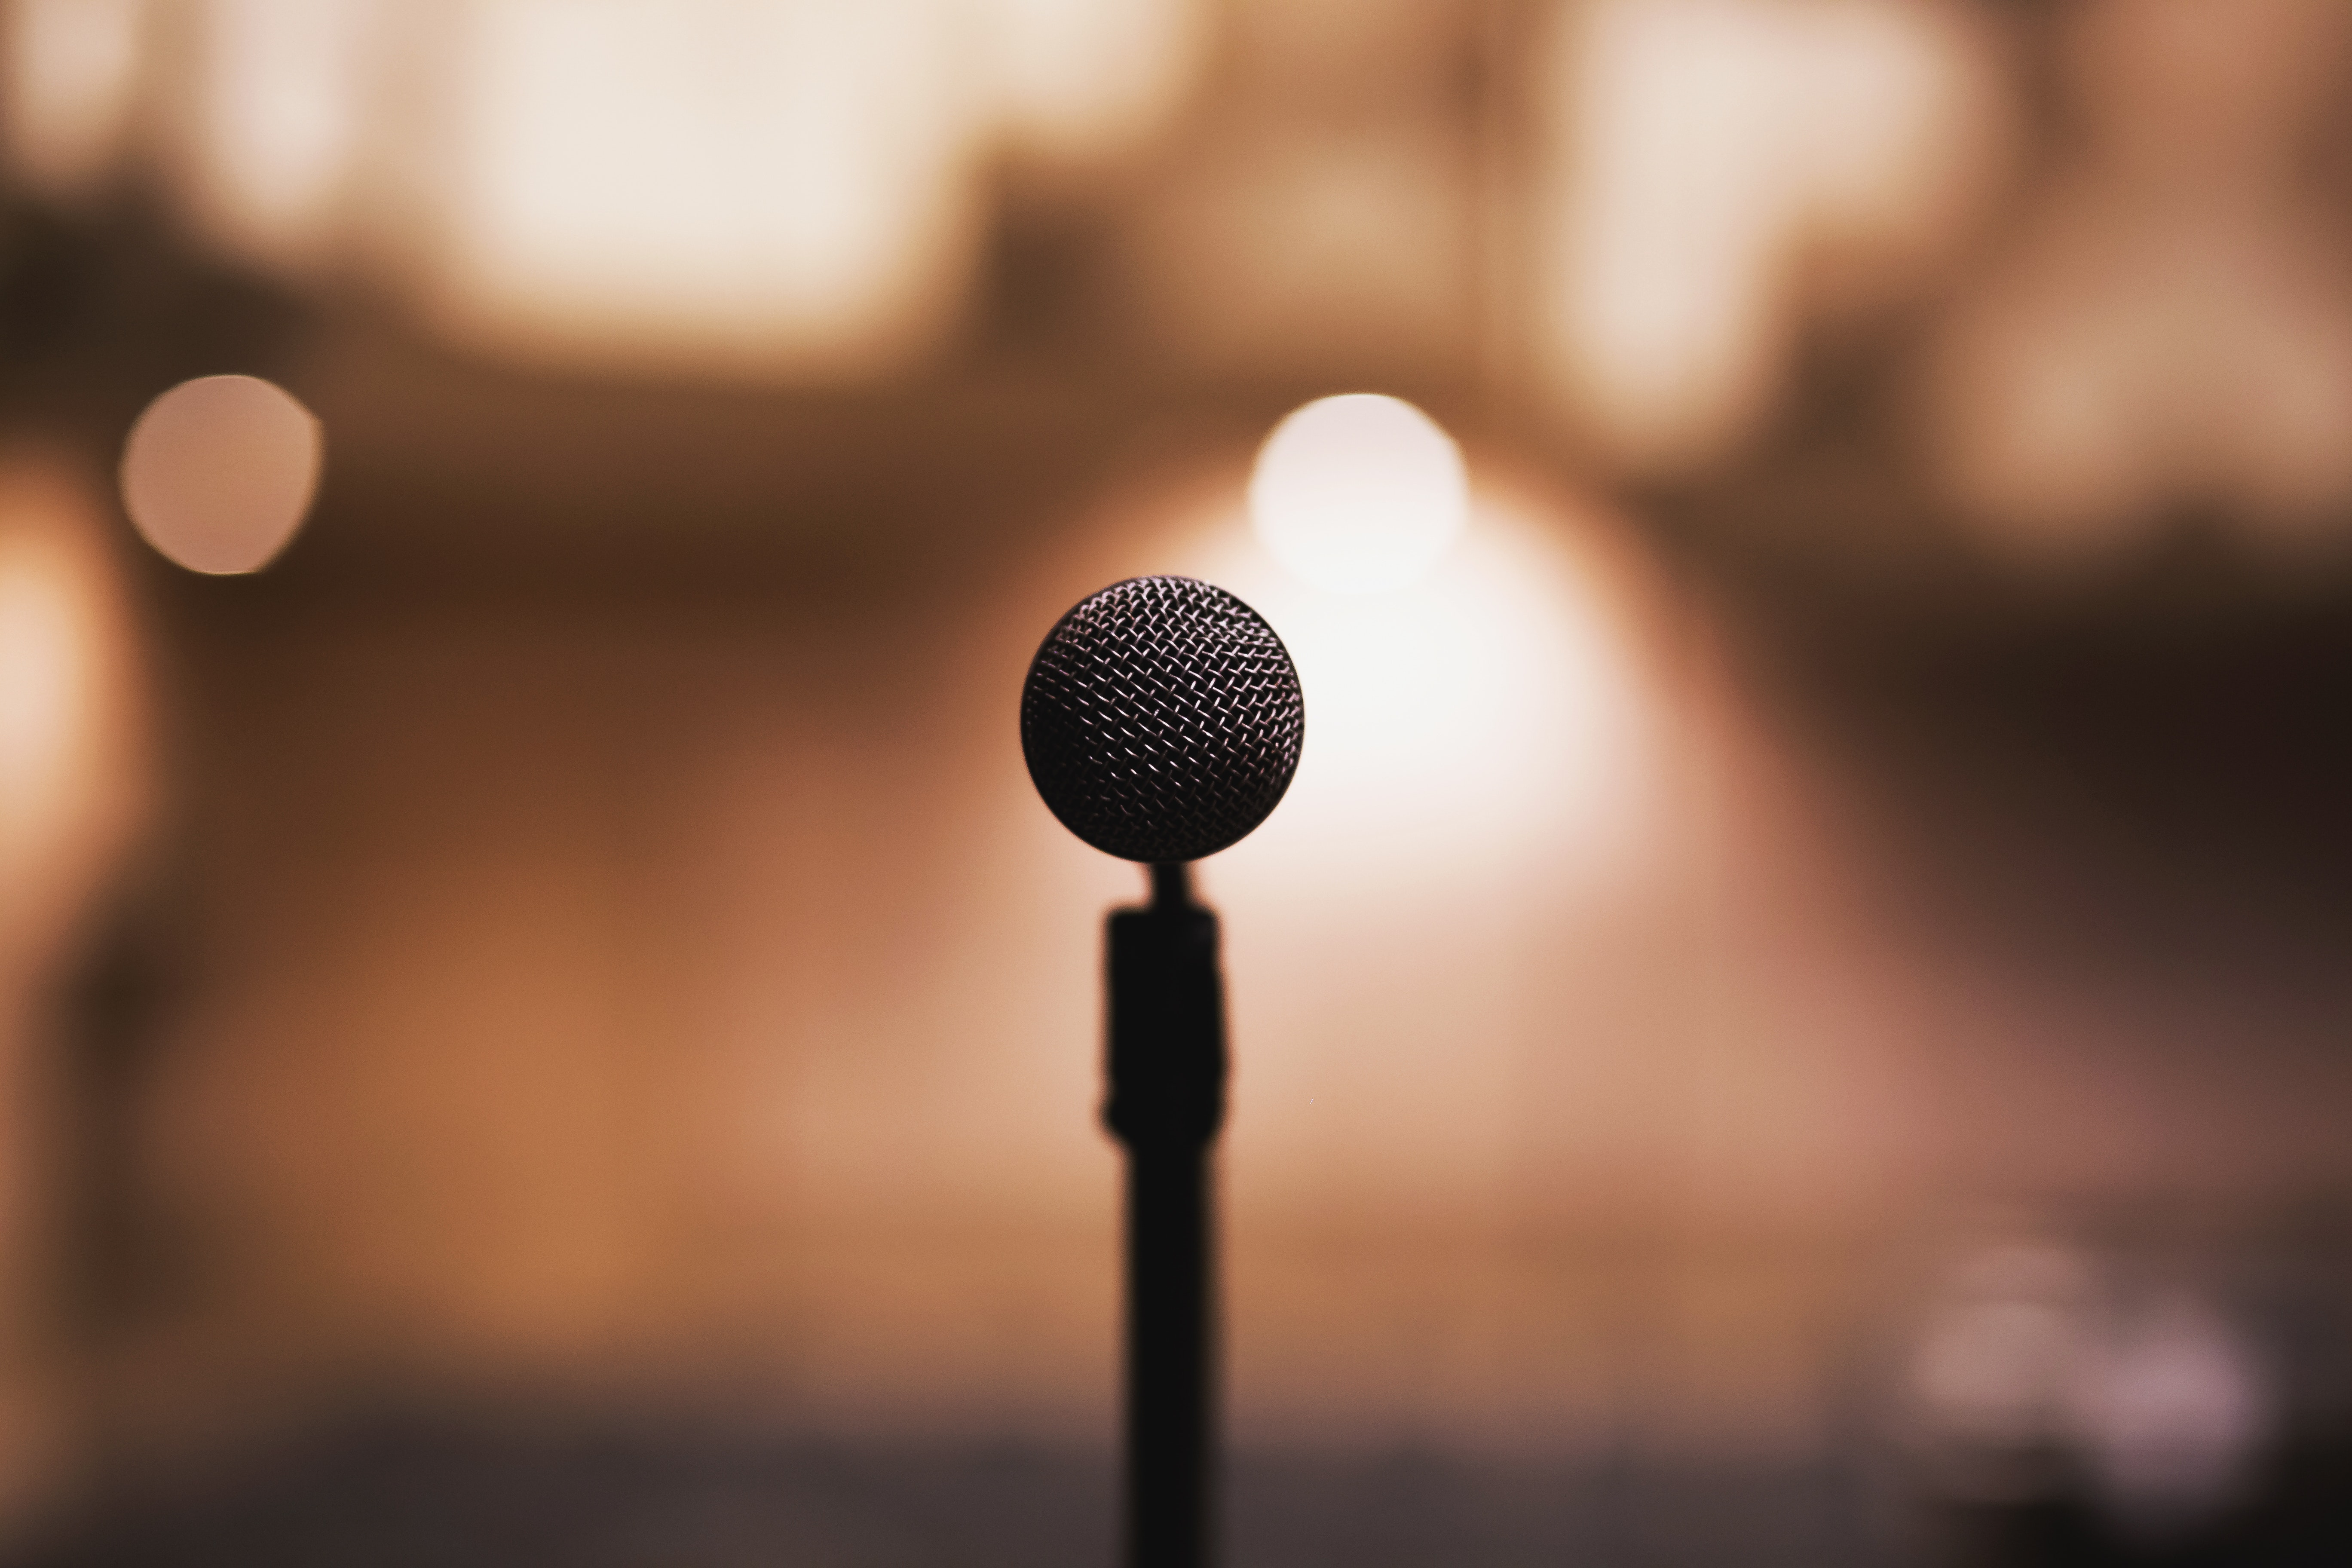 mic-mic-stand-microphone-64057